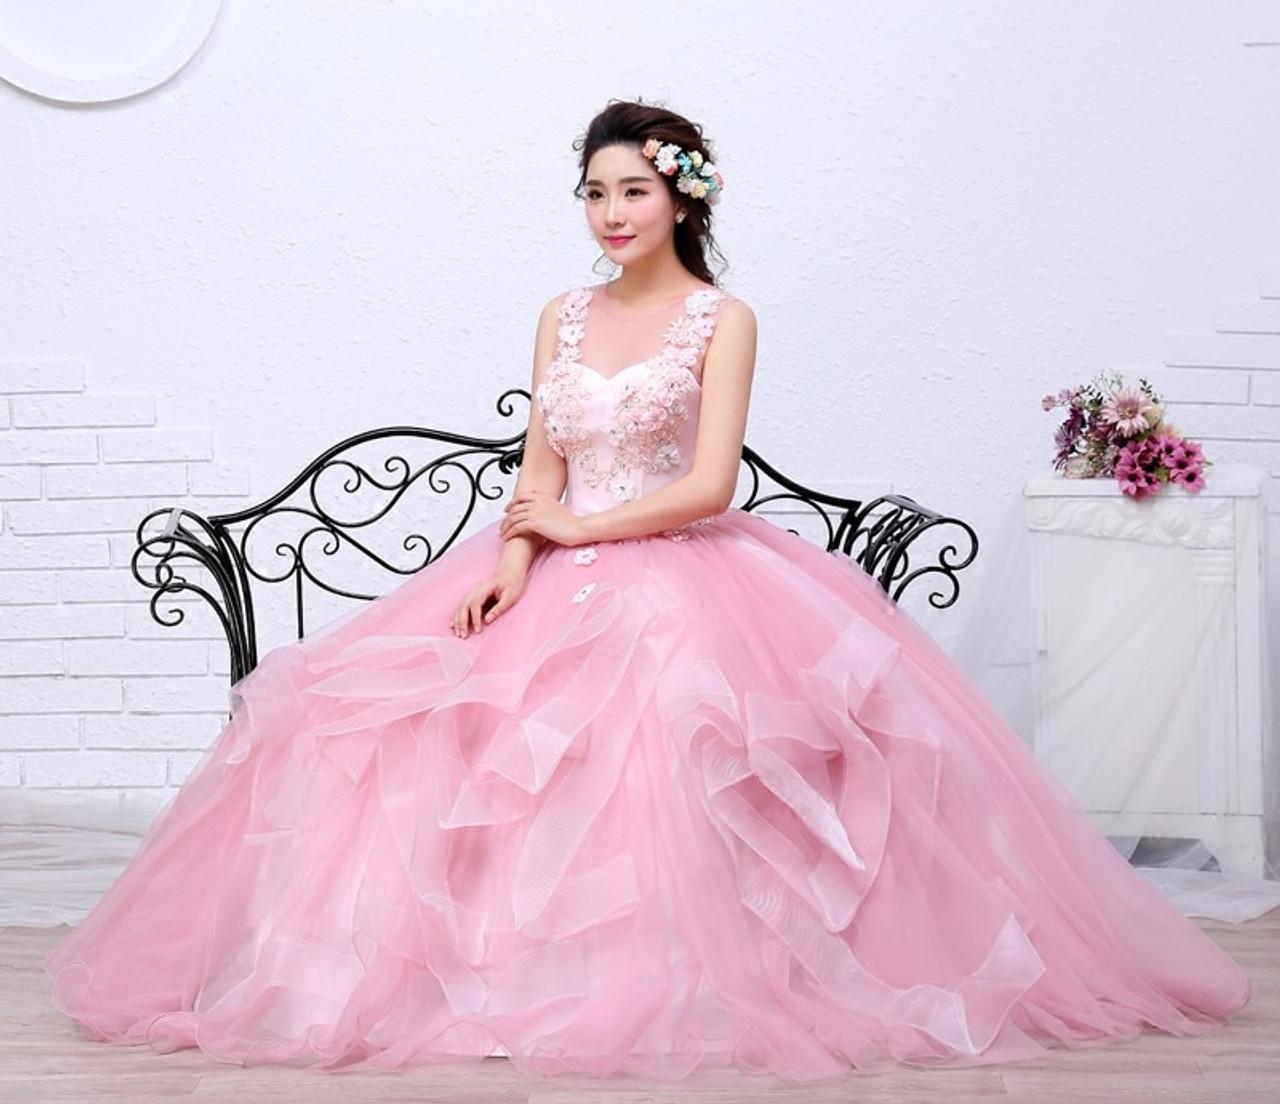 ... Free shippin Pink Color Yarn Girls Wedding dress 2017 New Fashion  Simple Female Art Exam Gowns ... 85c4337d4ffd